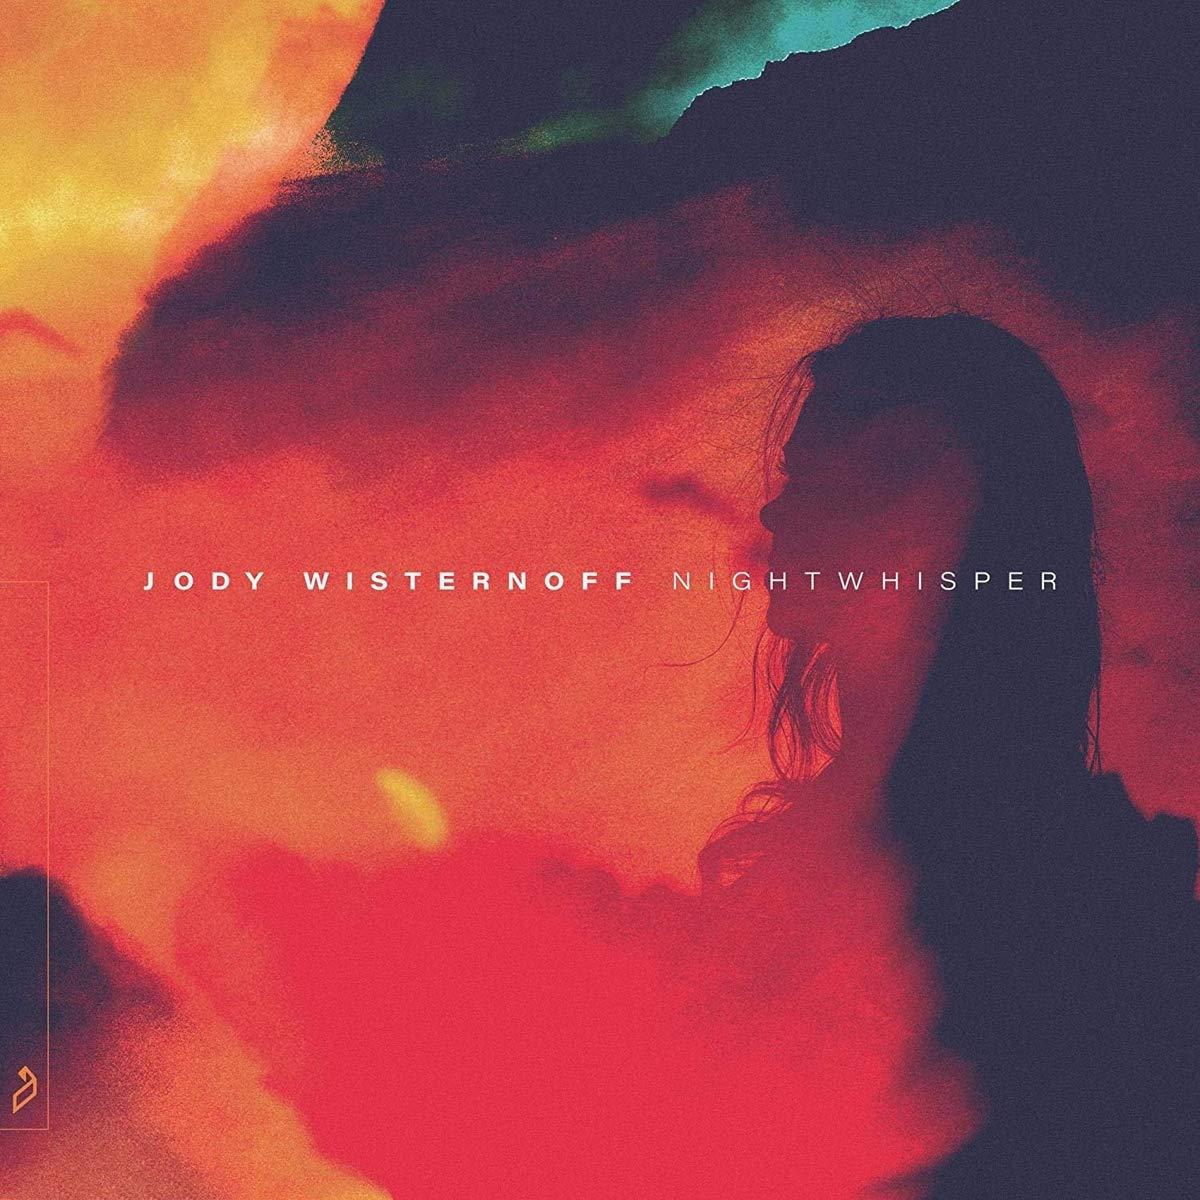 Jody Wisternoff – Nightwhisper (2020) [FLAC]